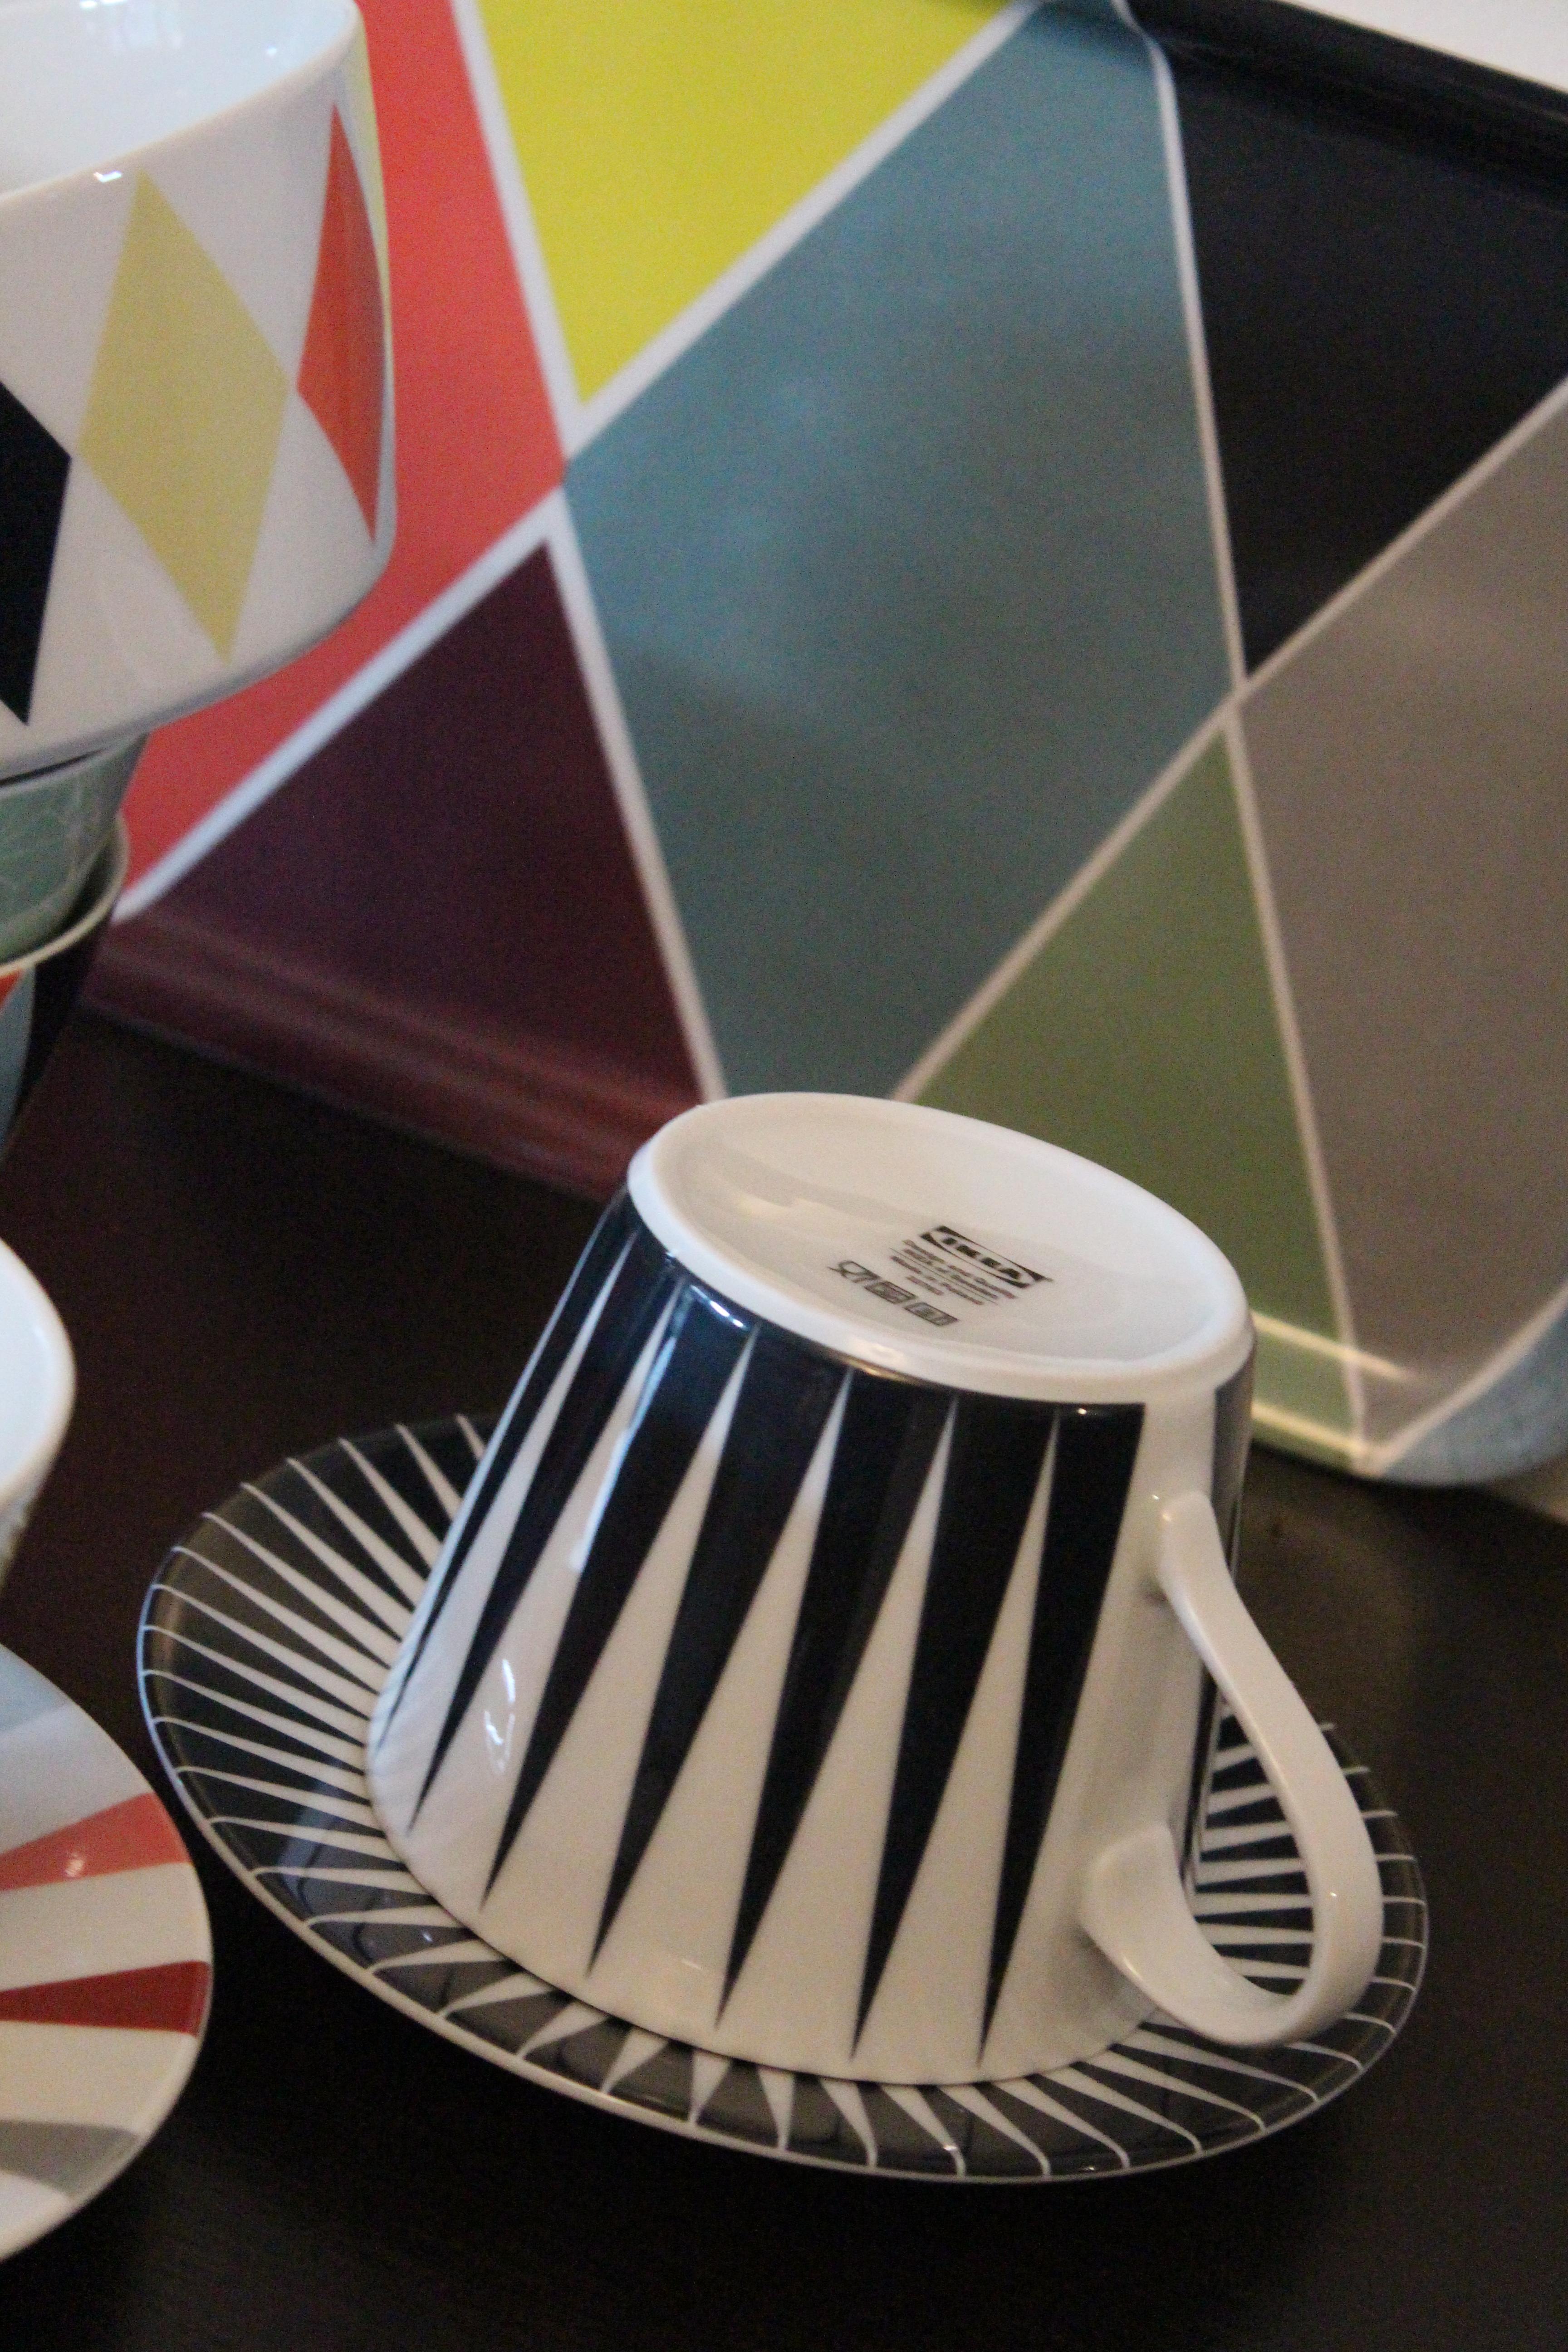 Mug Avec Ikea Ikea Tasses Avec Multicolores Mug Multicolores Ikea Tasses Mug fgy67b